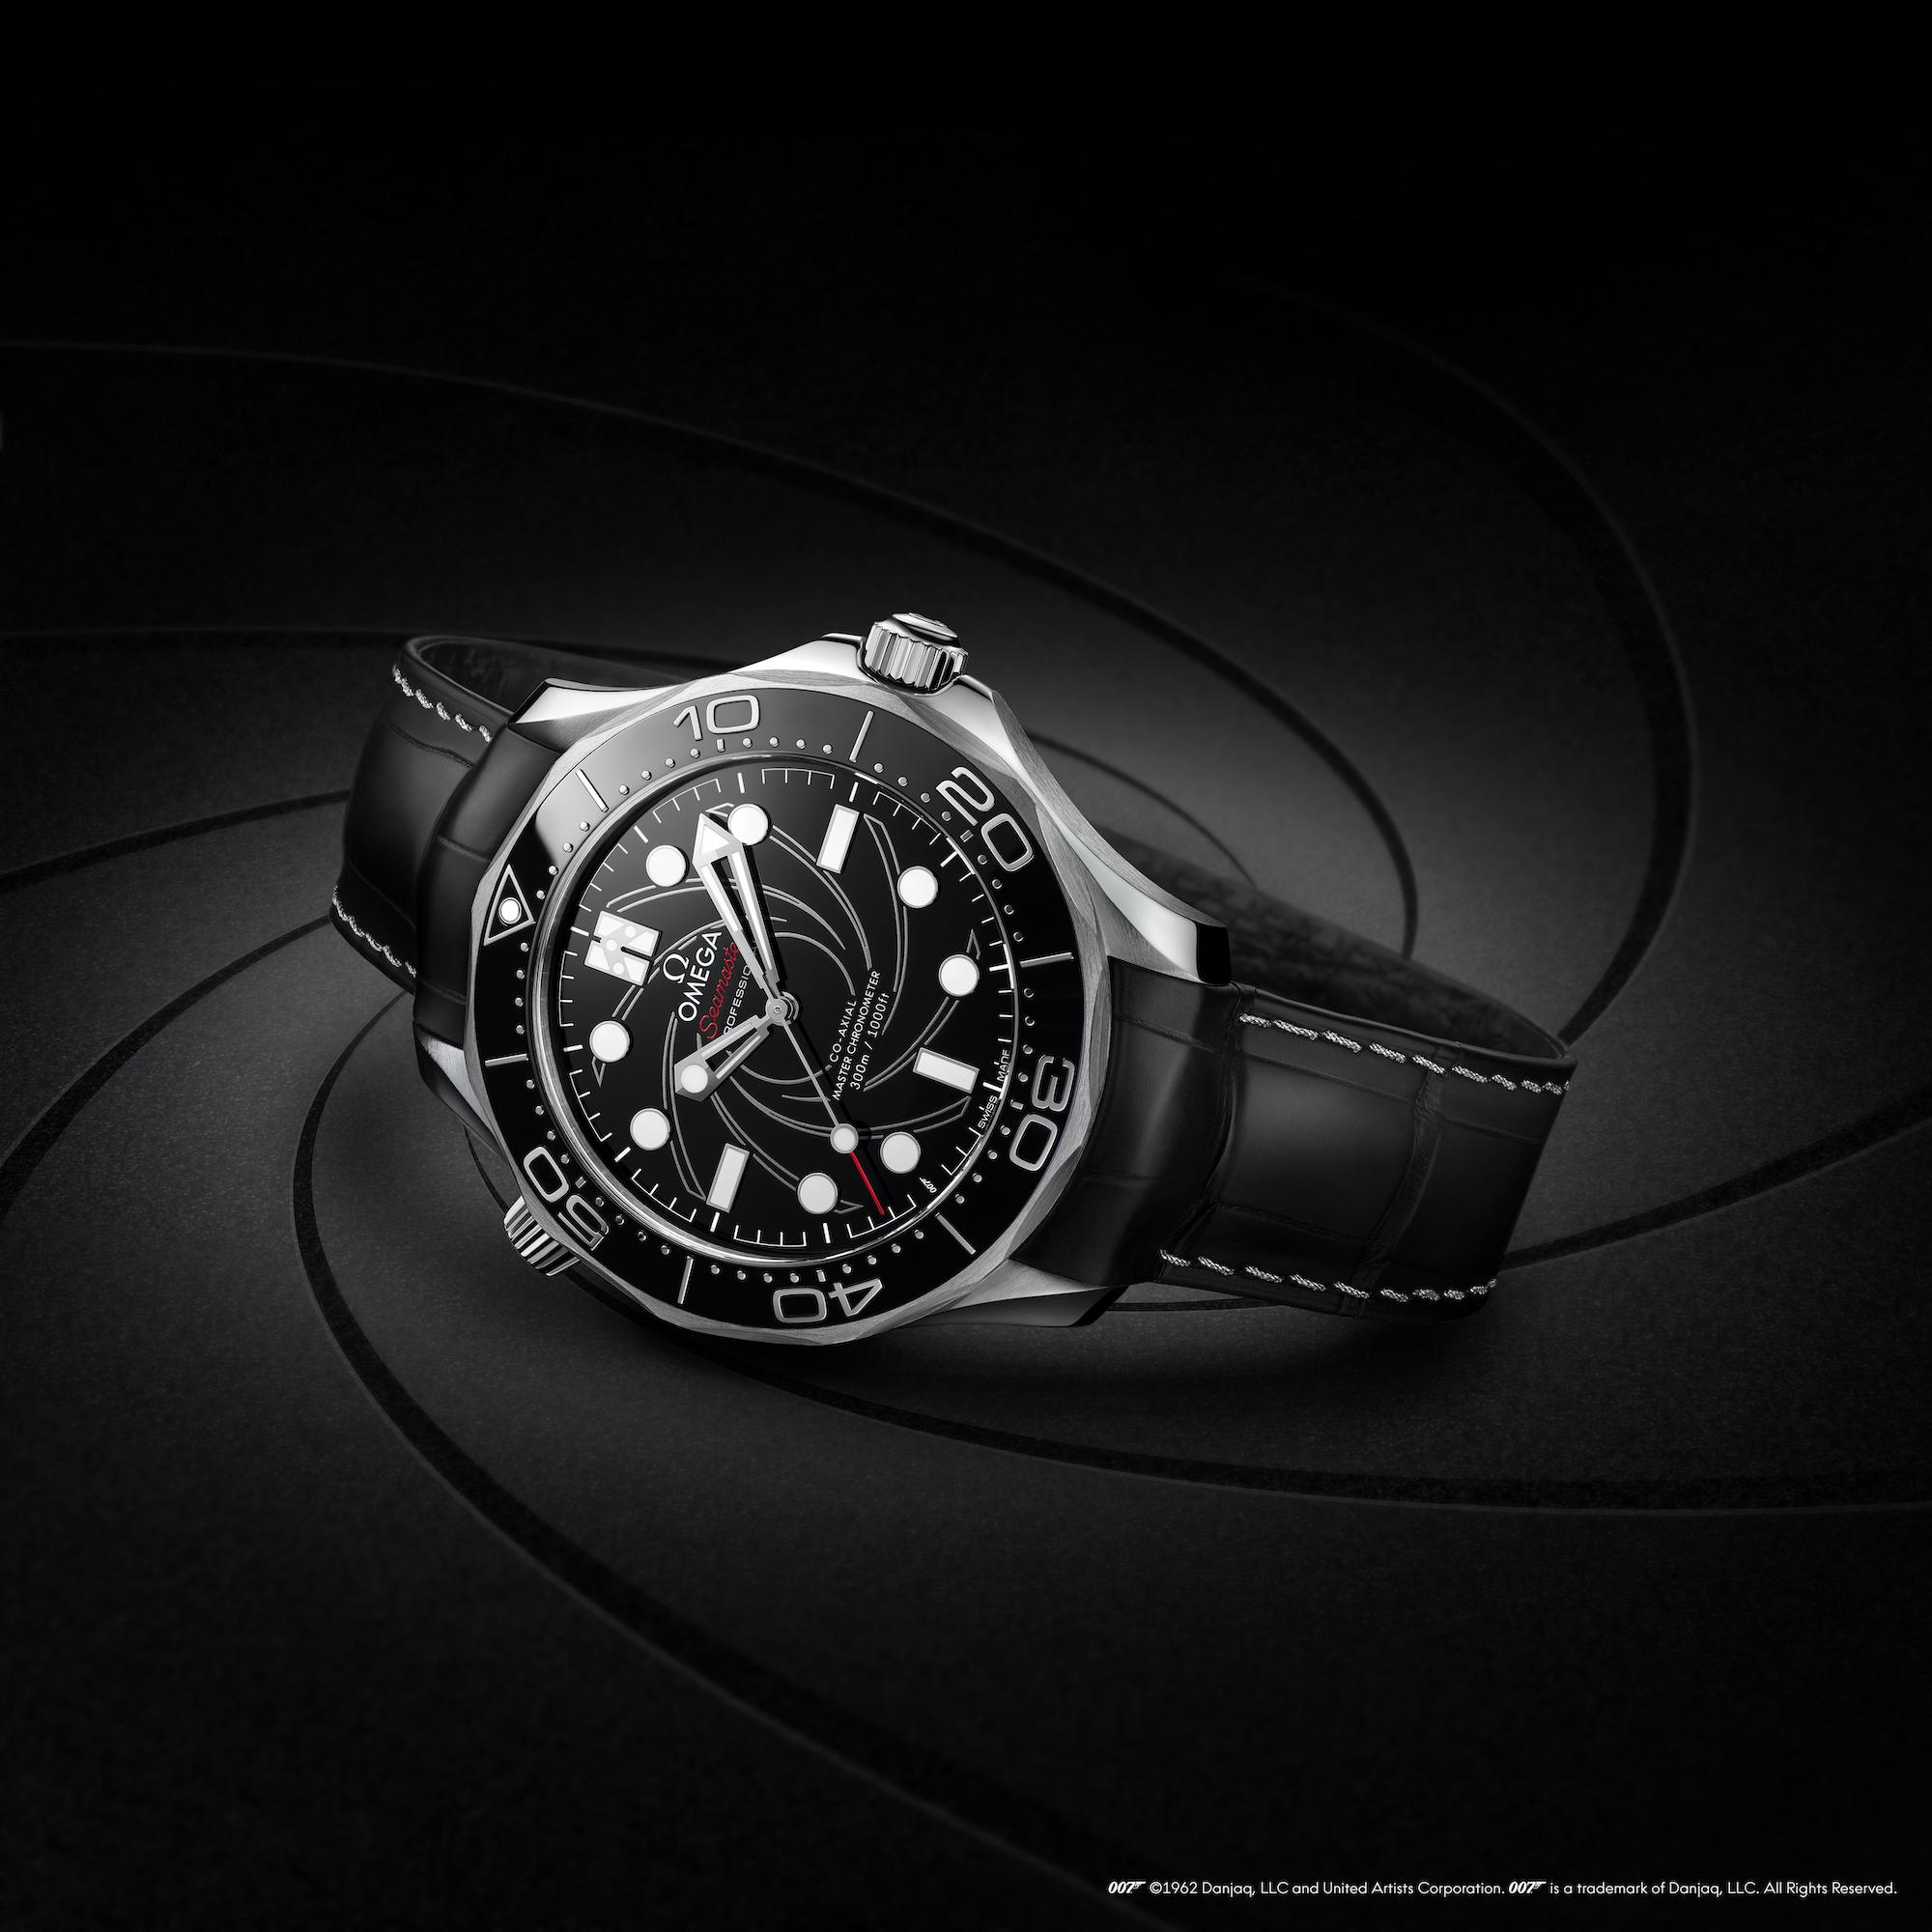 Omega Seamaster Diver 300M James Bond Platino Oro 210.93.42.20.01.001 lifestyle 2